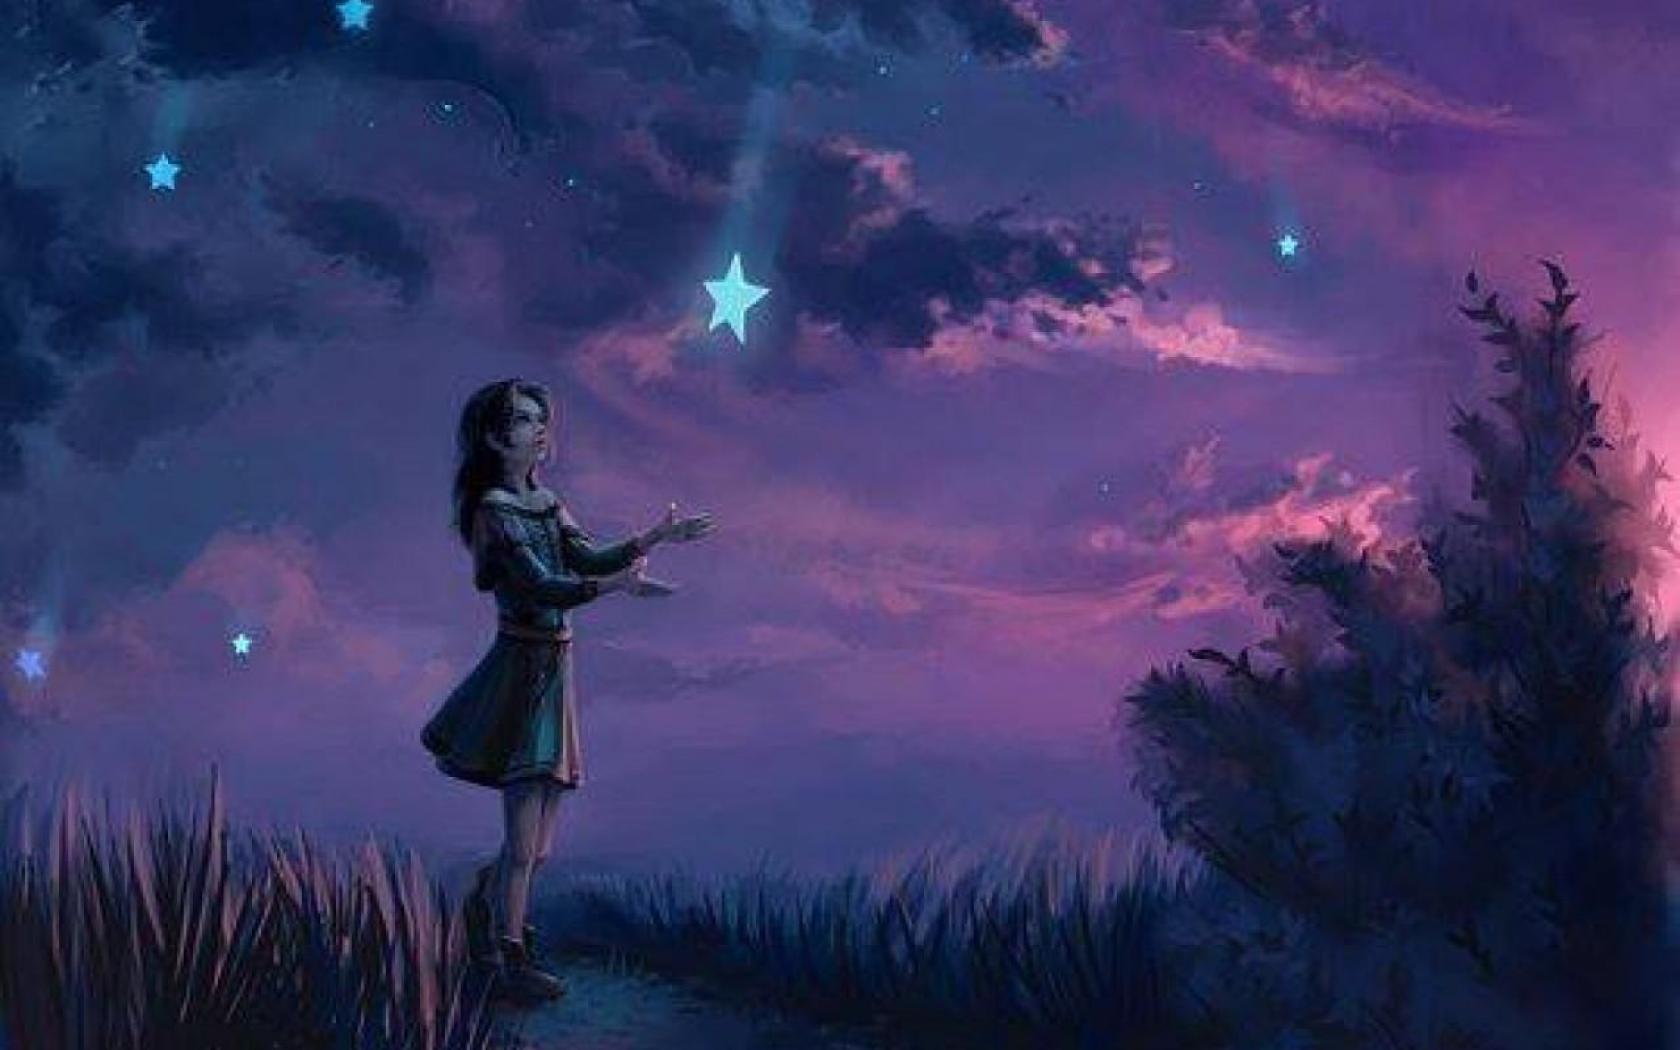 72] Shooting Stars Wallpaper on WallpaperSafari 1680x1050